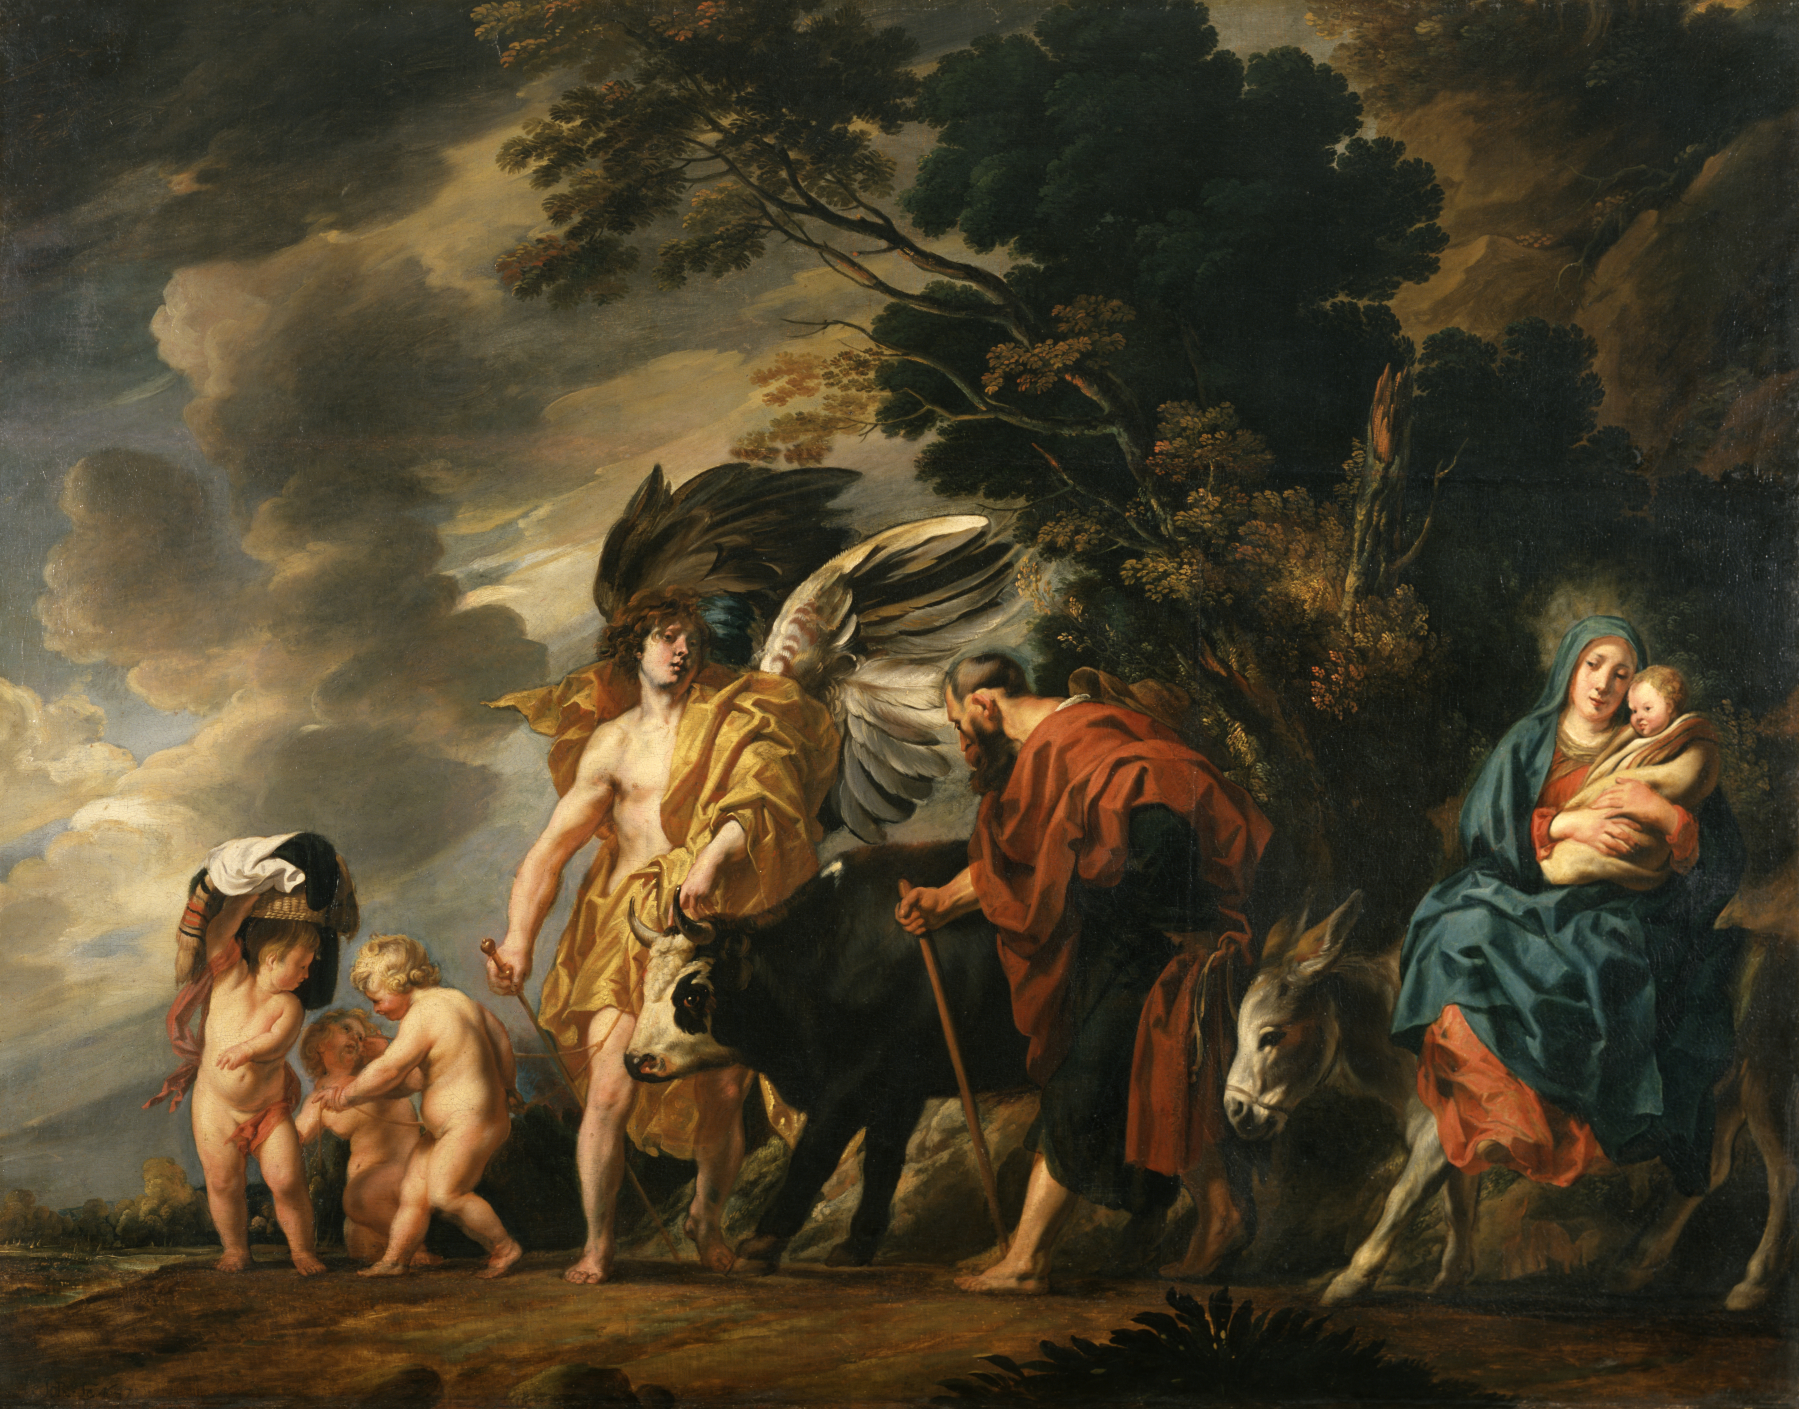 Jacob_Jordaens_the_elder_-_Flight_of_the_Holy_Family_into_Egypt_-_Walters_372368